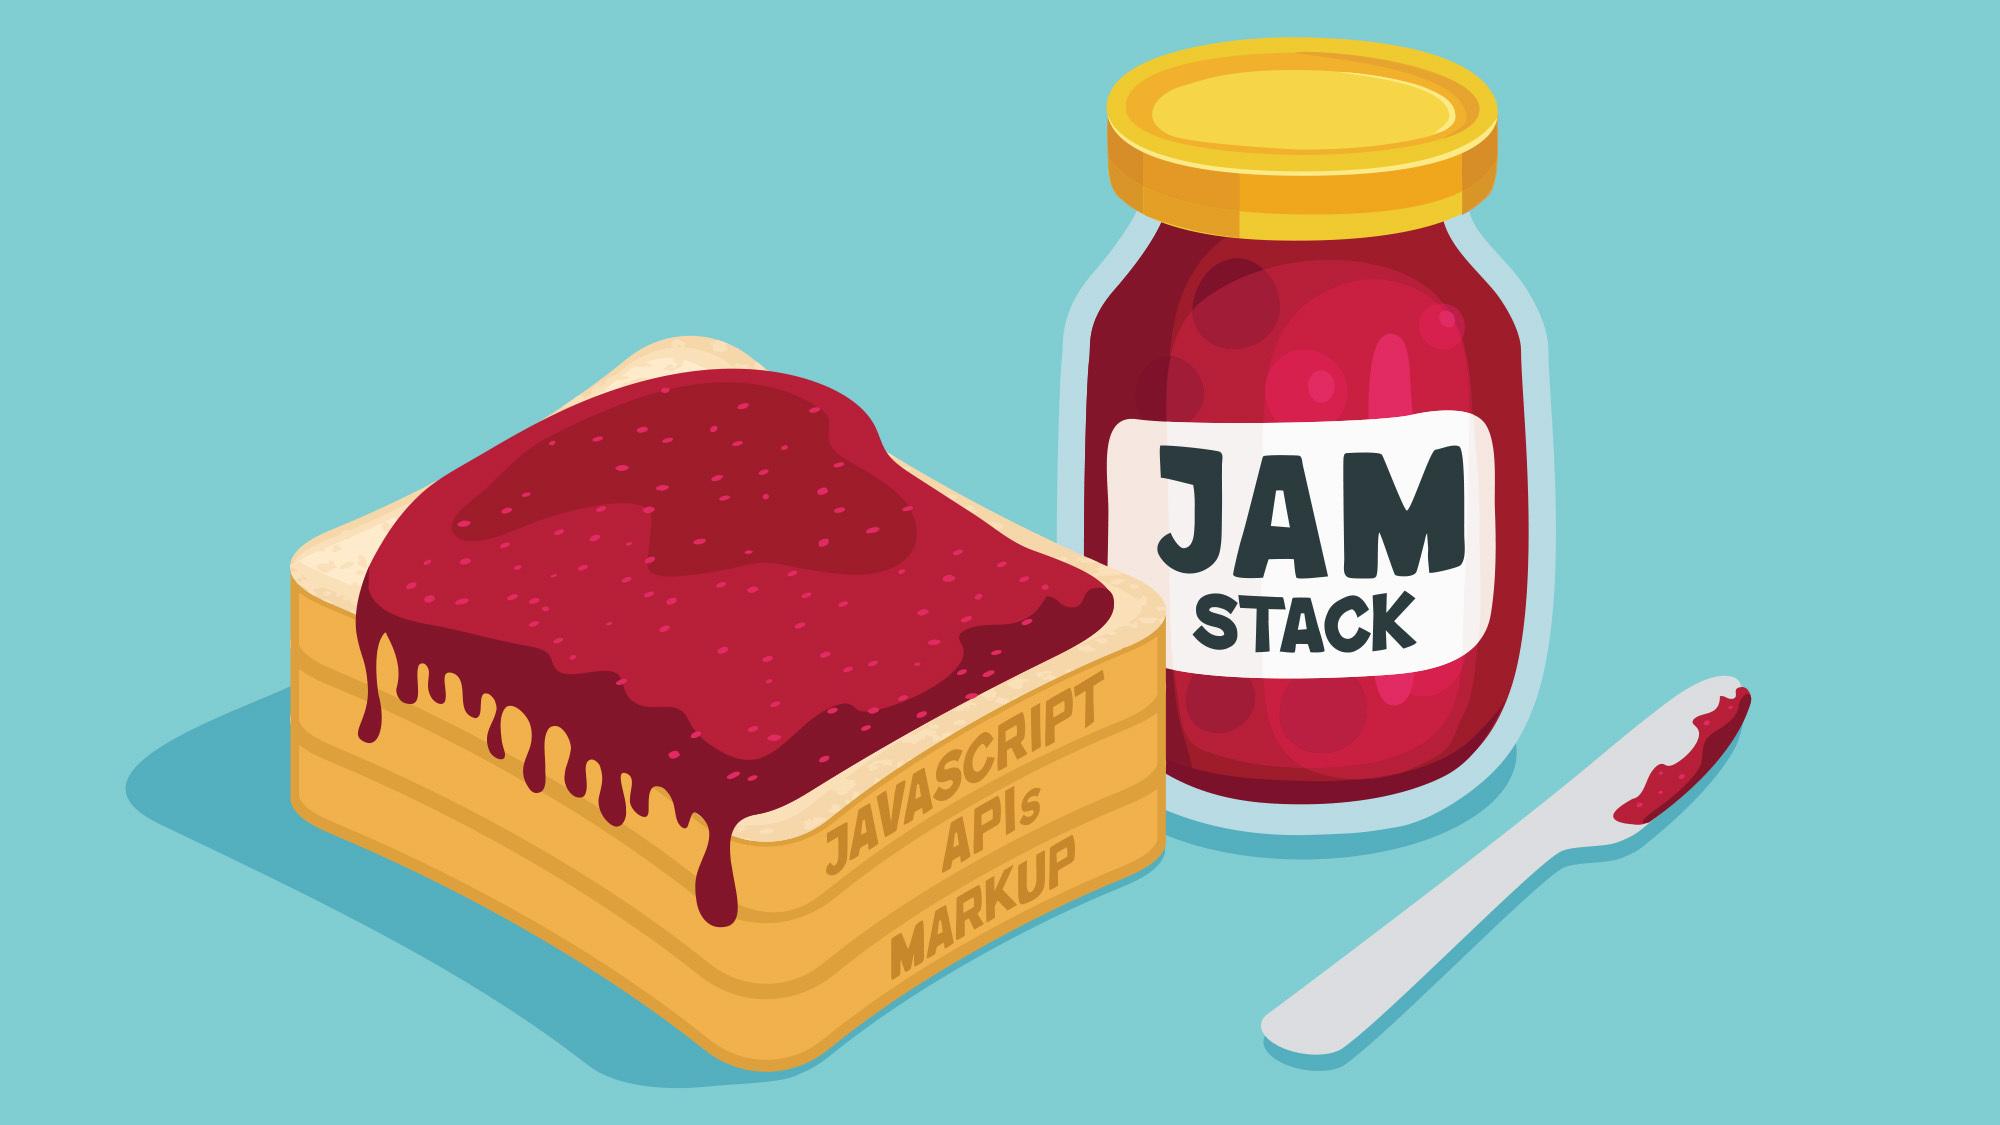 Jar of Jam and a toast